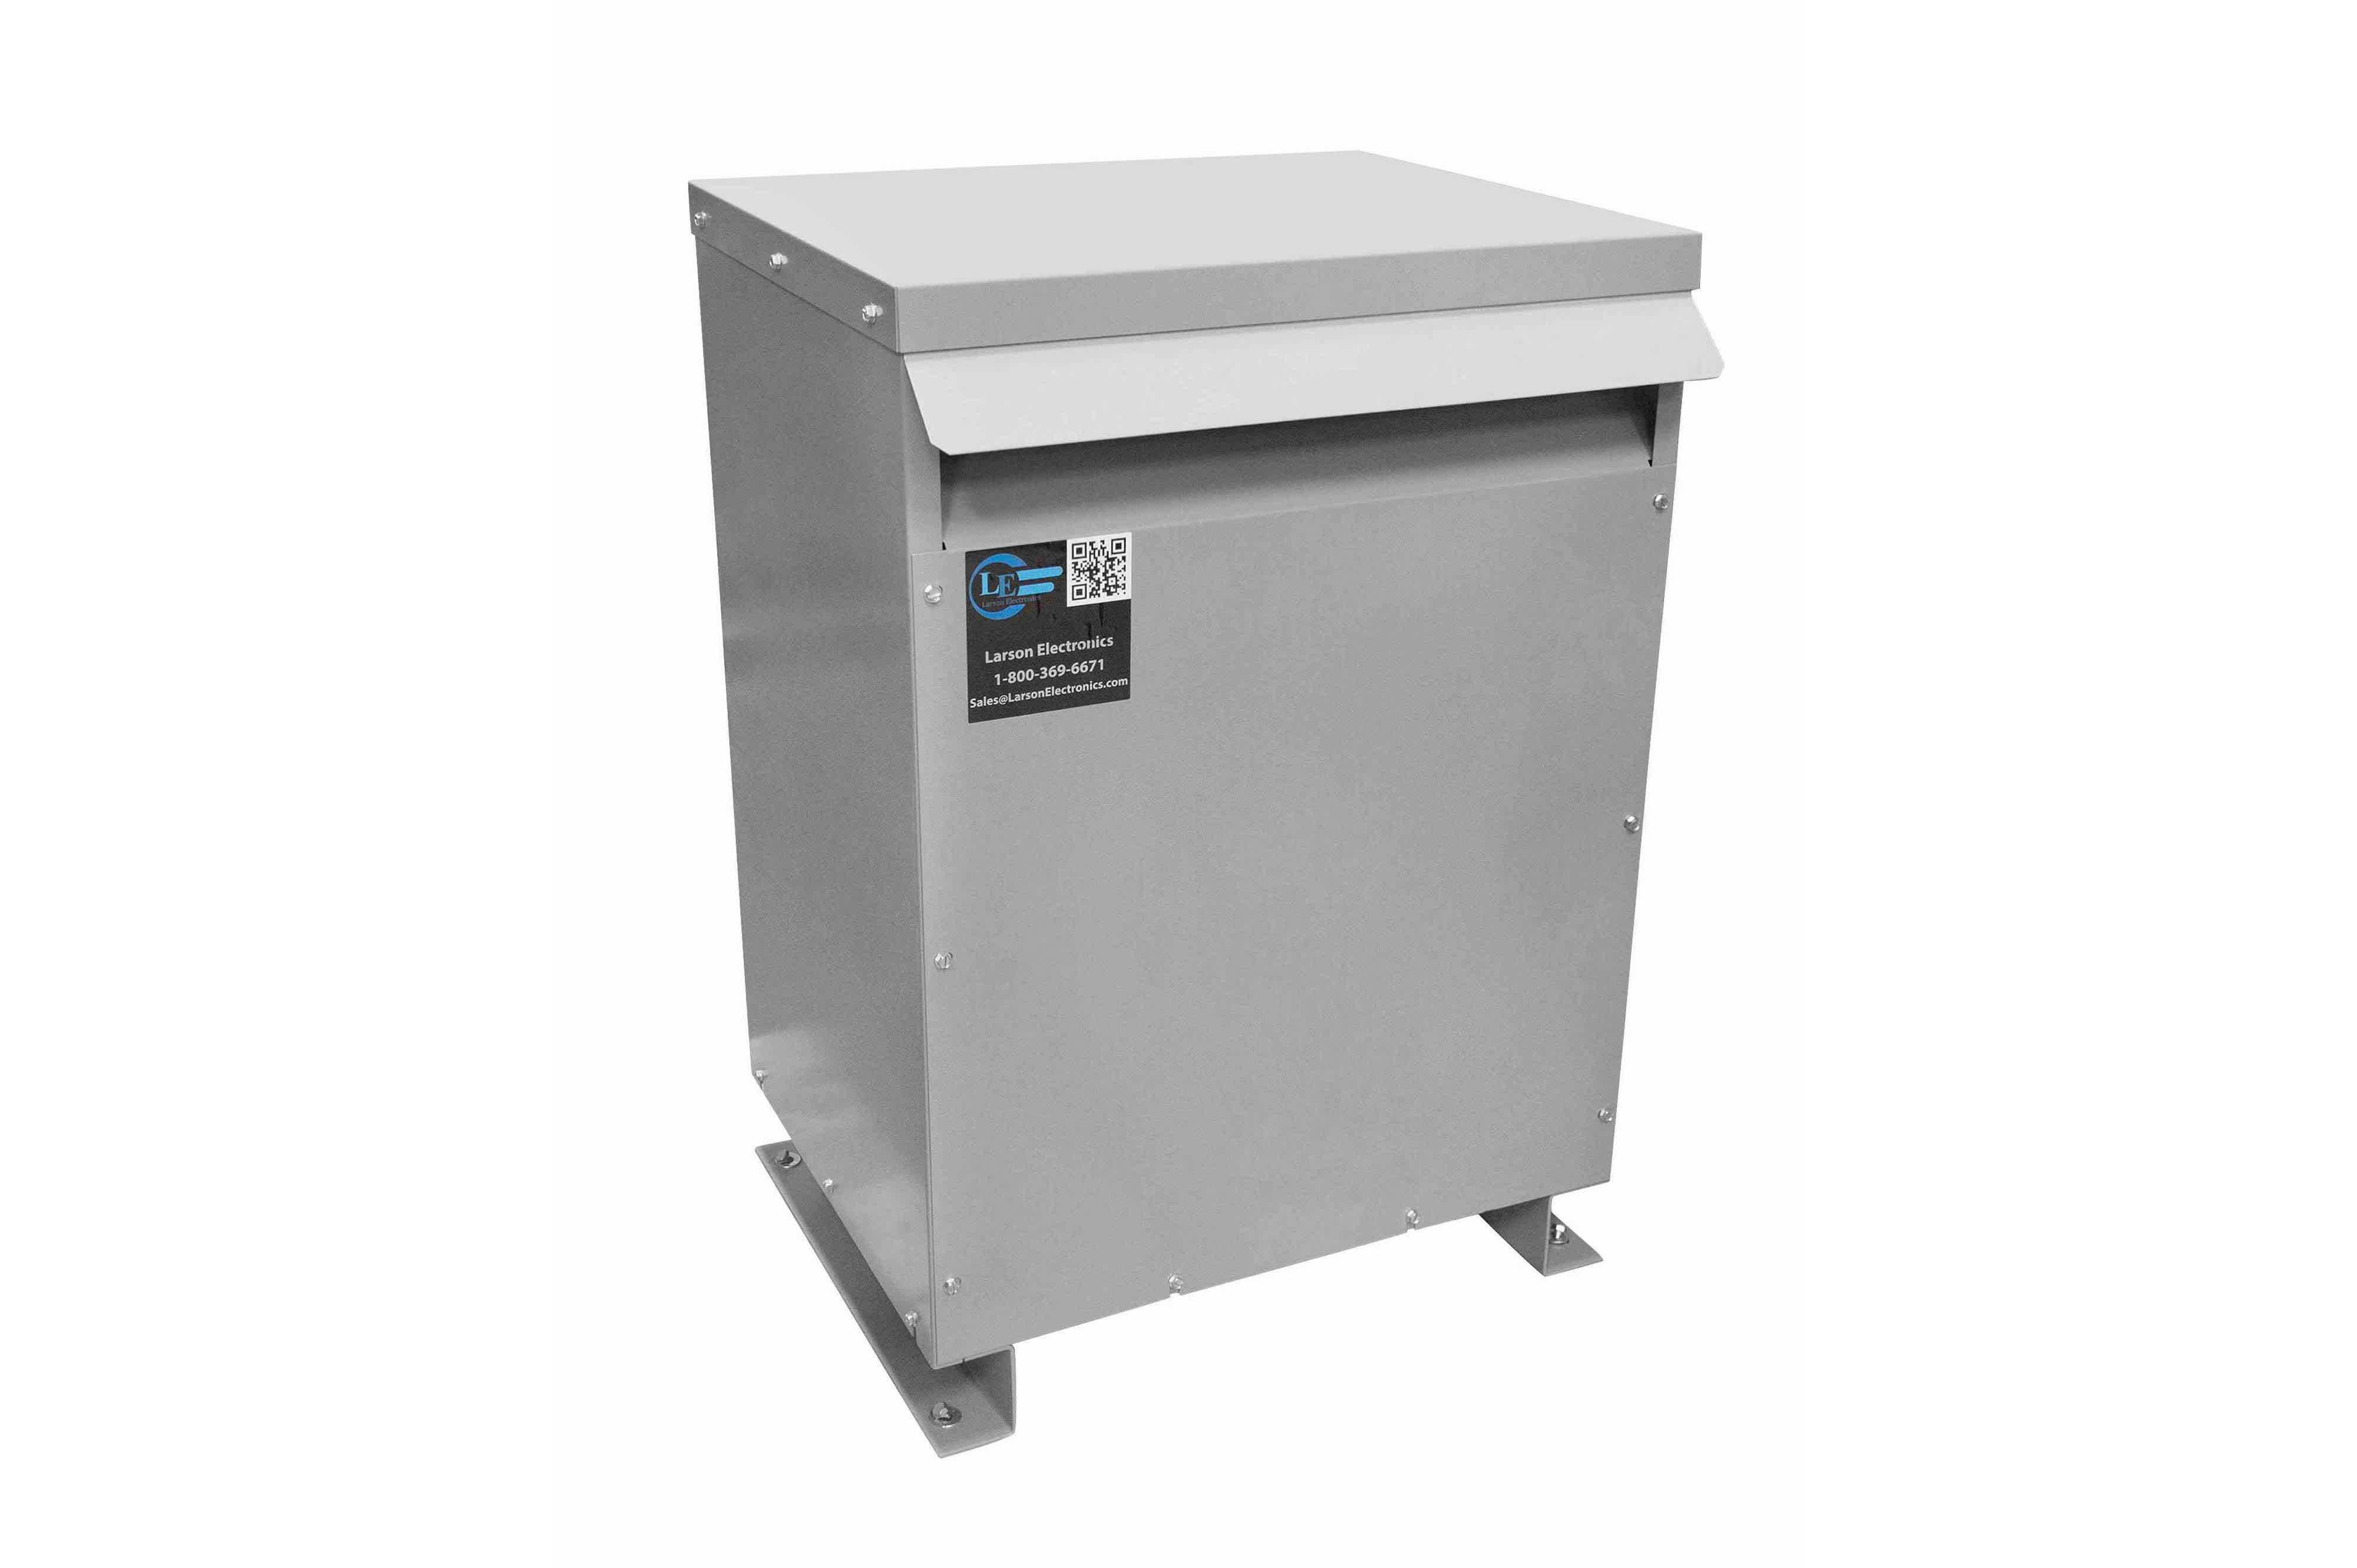 29 kVA 3PH Isolation Transformer, 480V Wye Primary, 600Y/347 Wye-N Secondary, N3R, Ventilated, 60 Hz